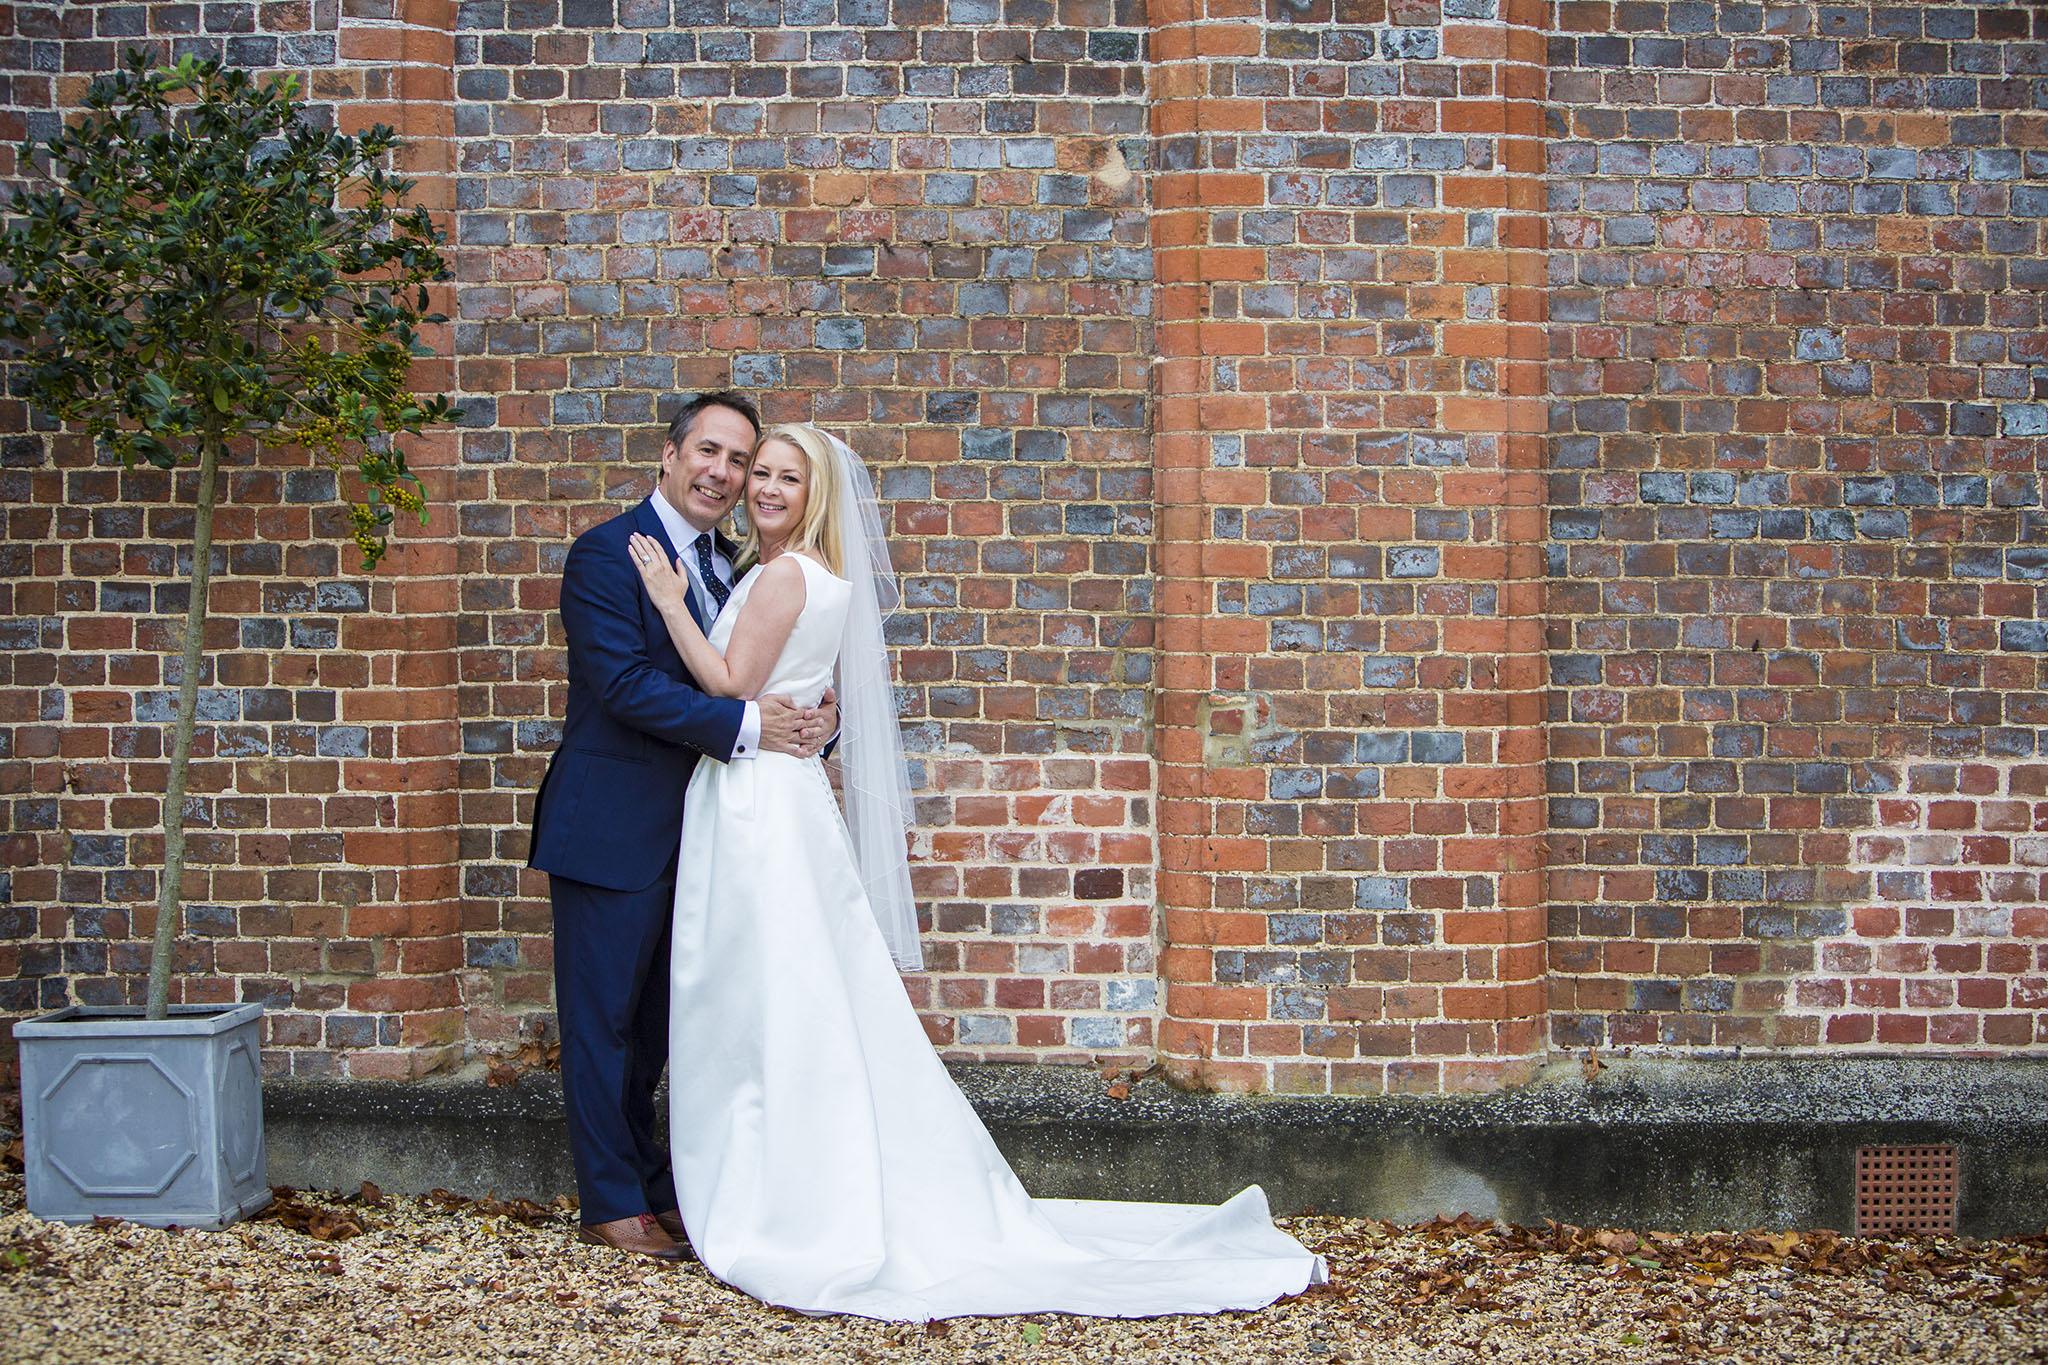 elizabethg_photography_hertfordshire_fineart_photographer_tonycharlie_wedding_photography_aldermaston_wasing_park_reading_40.jpg